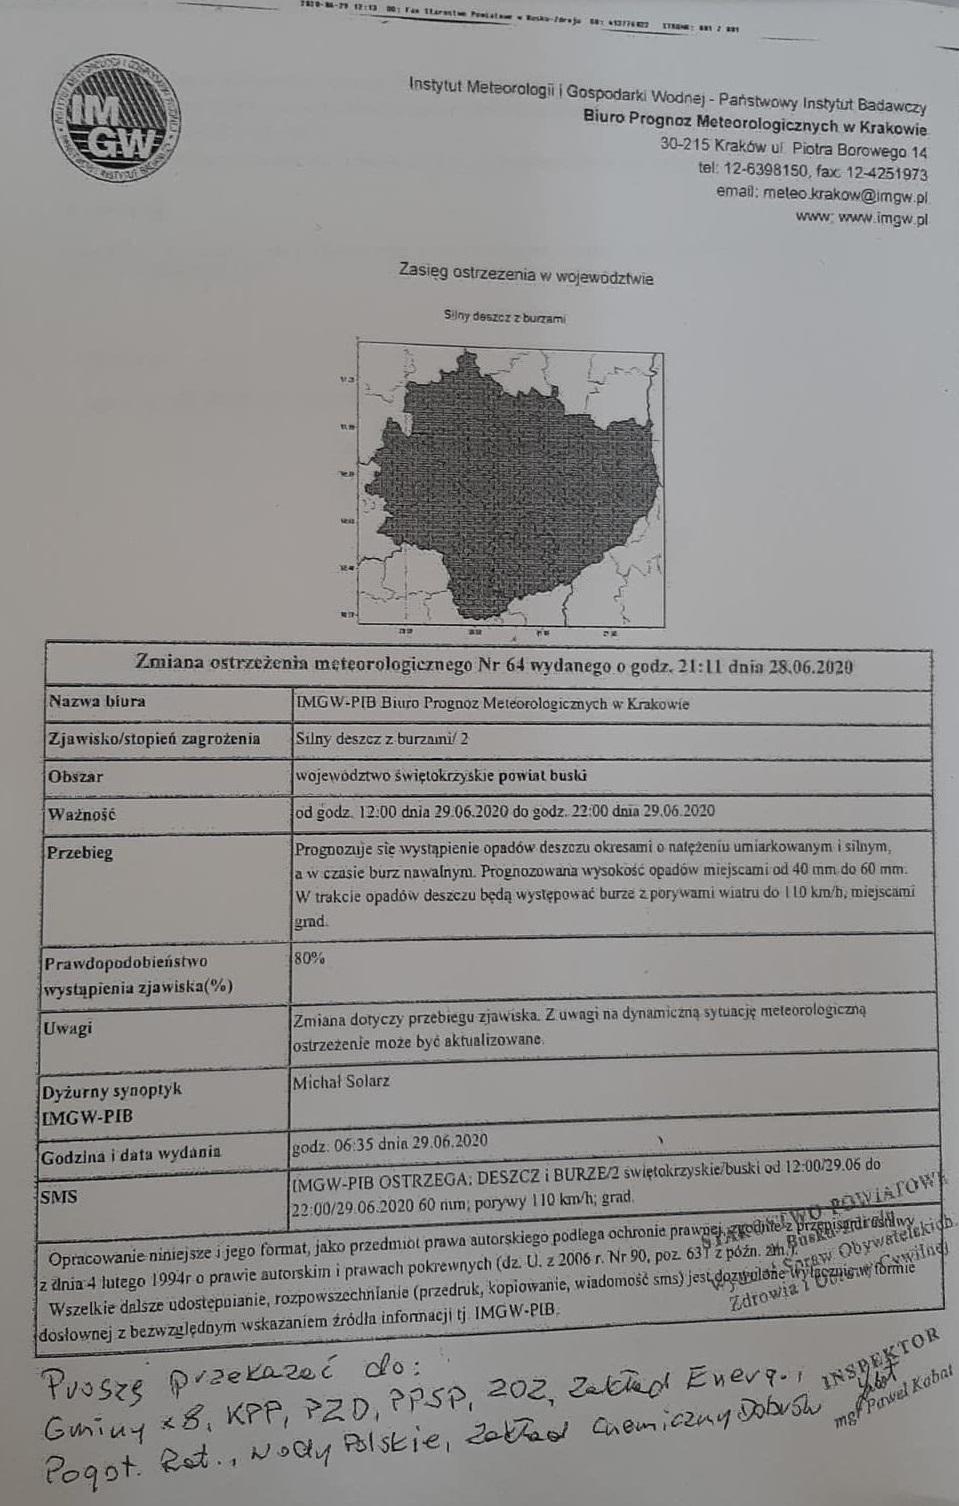 ostrzezenie_meteo_29_06_2020.jpg